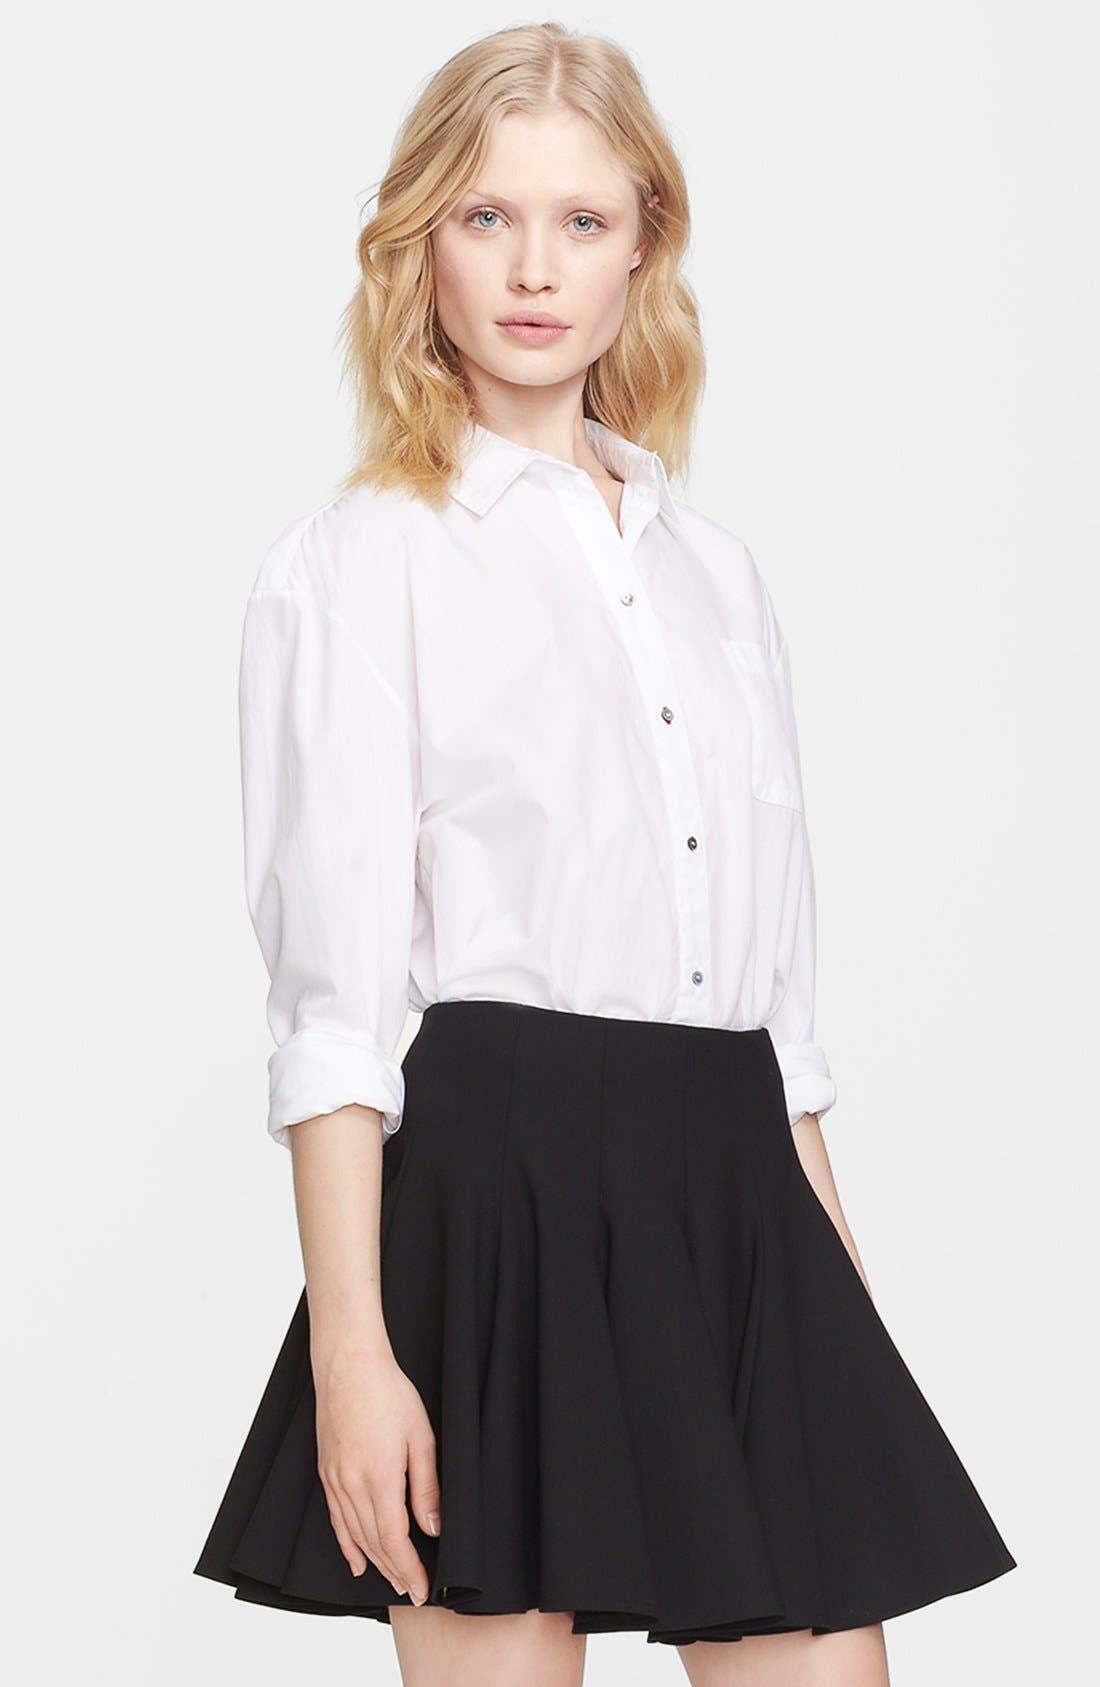 Alternate Image 1 Selected - Elizabeth and James 'Carine' Cotton Shirt